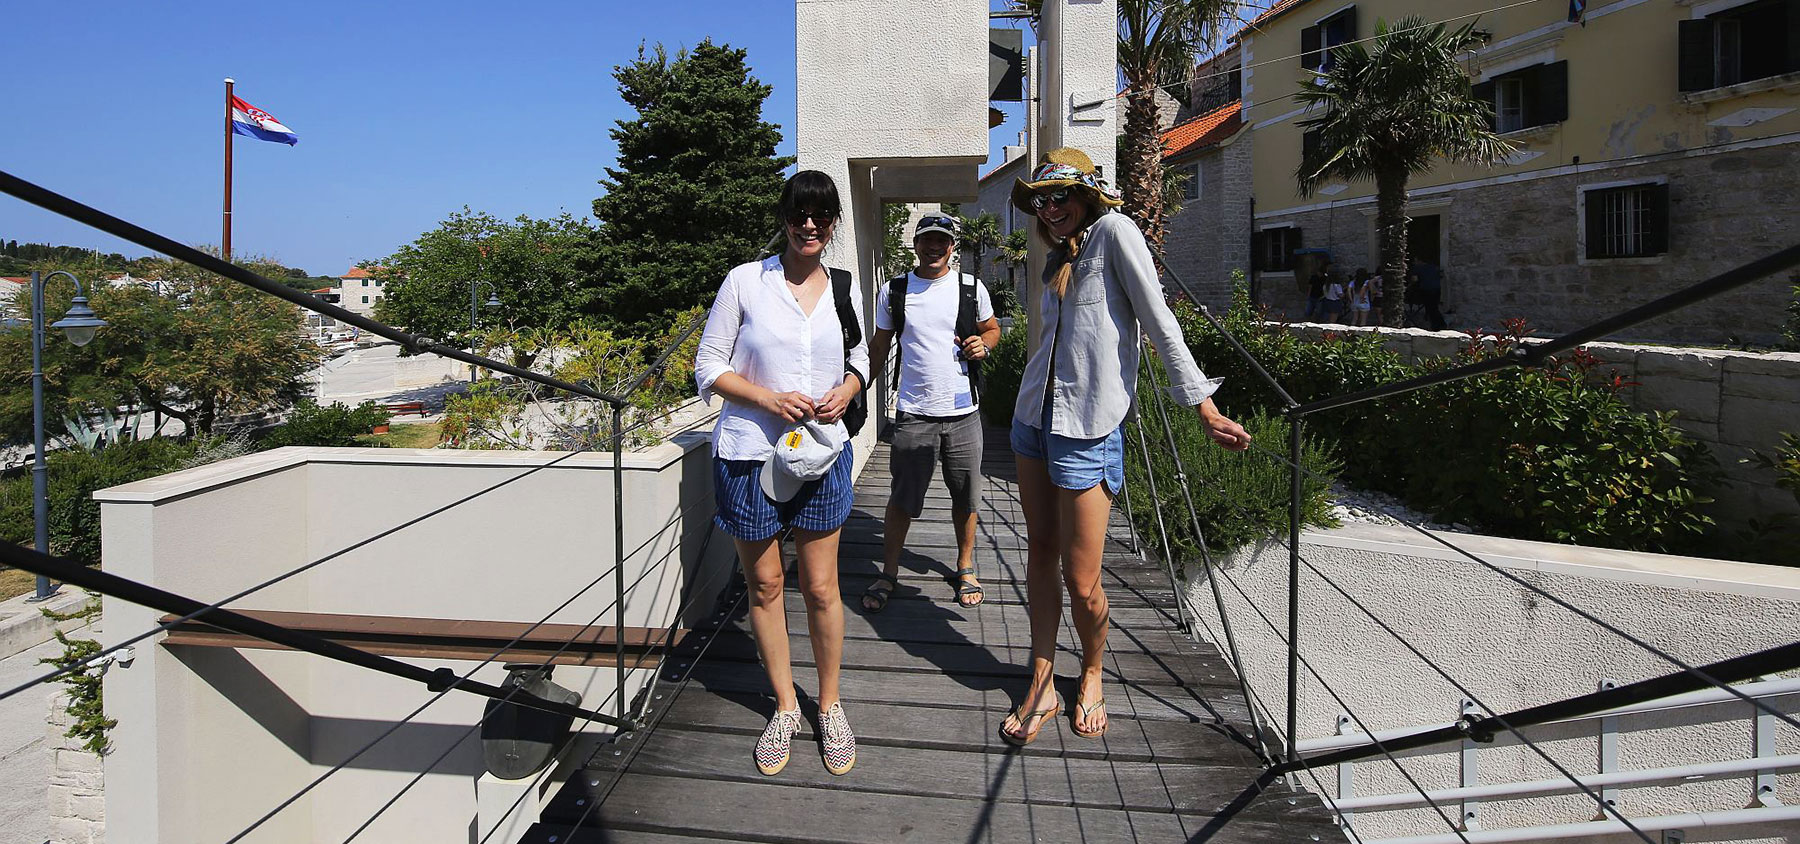 Archipelago Tours Blog and Tips: The sunscreen problem